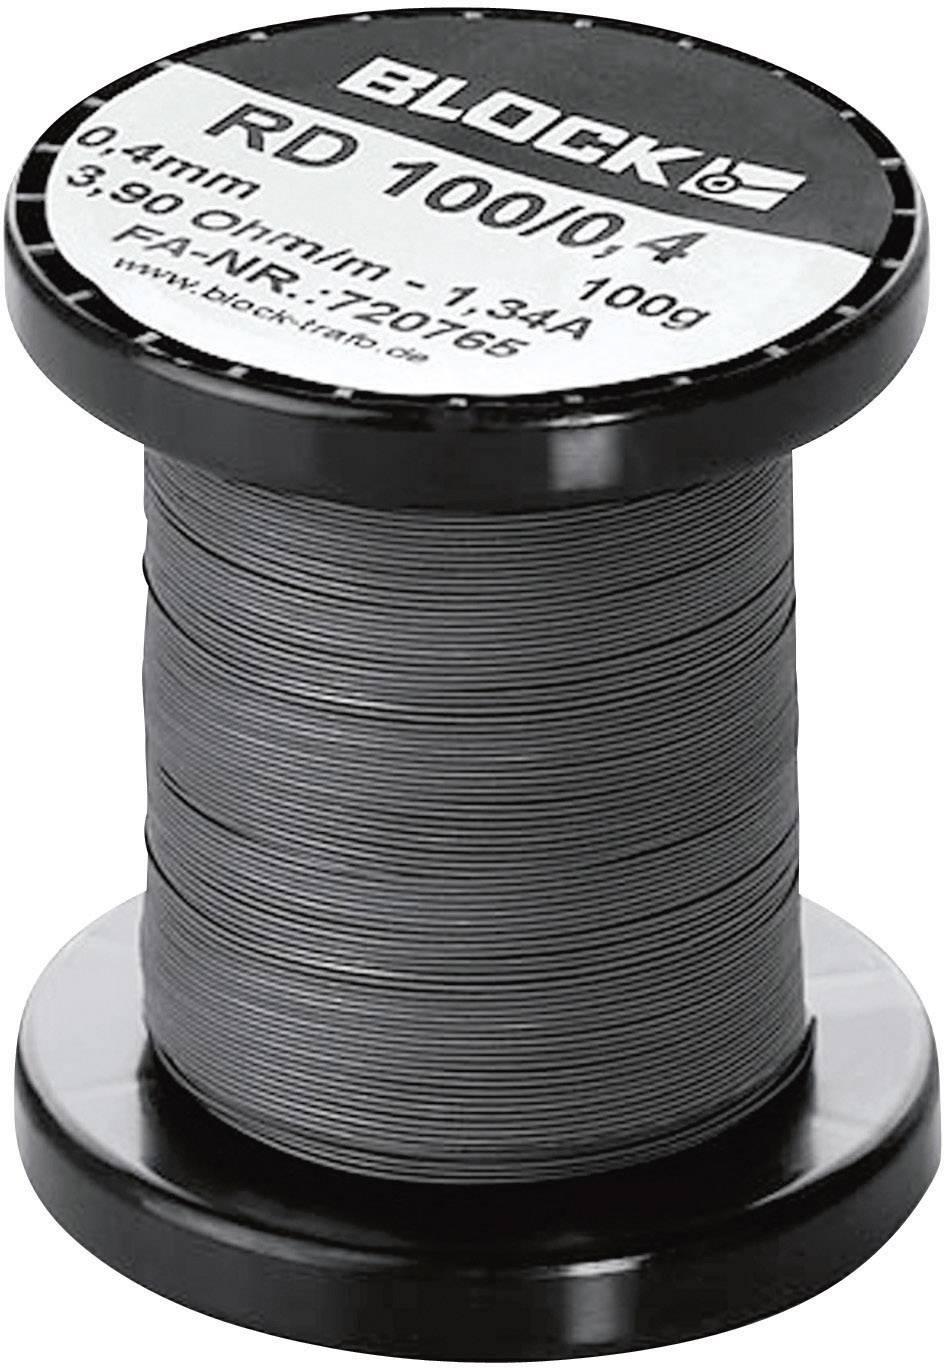 Odporový drát (konstantan) Block RD 100/3,0, 0.069 Ω/m, 1.5 m